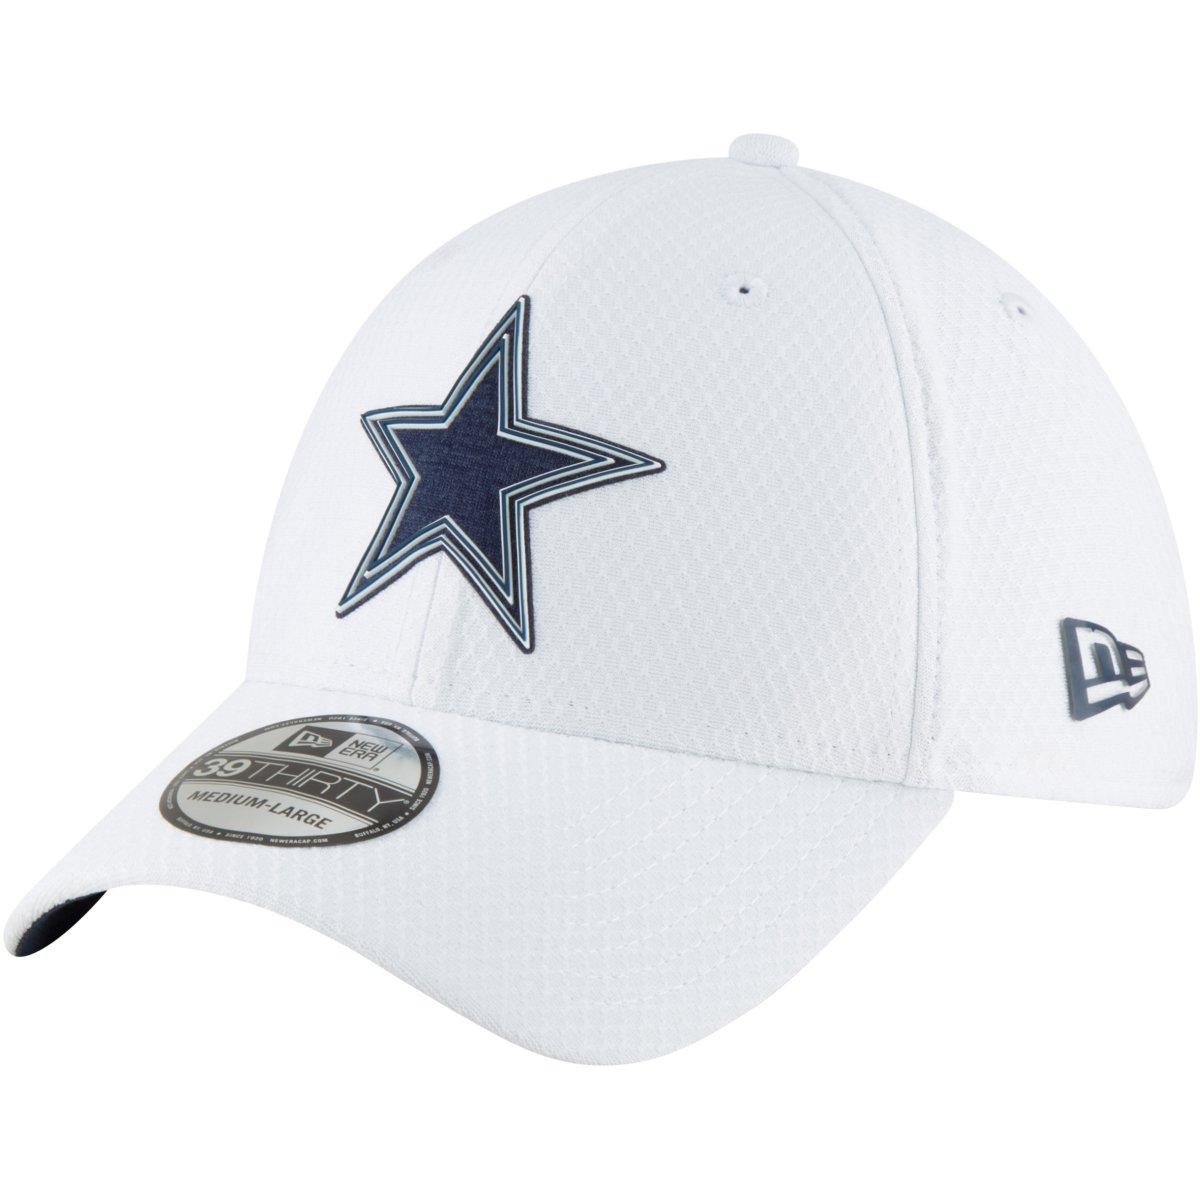 New Era 39Thirty Cap - TRAINING Dallas Cowboys | eBay